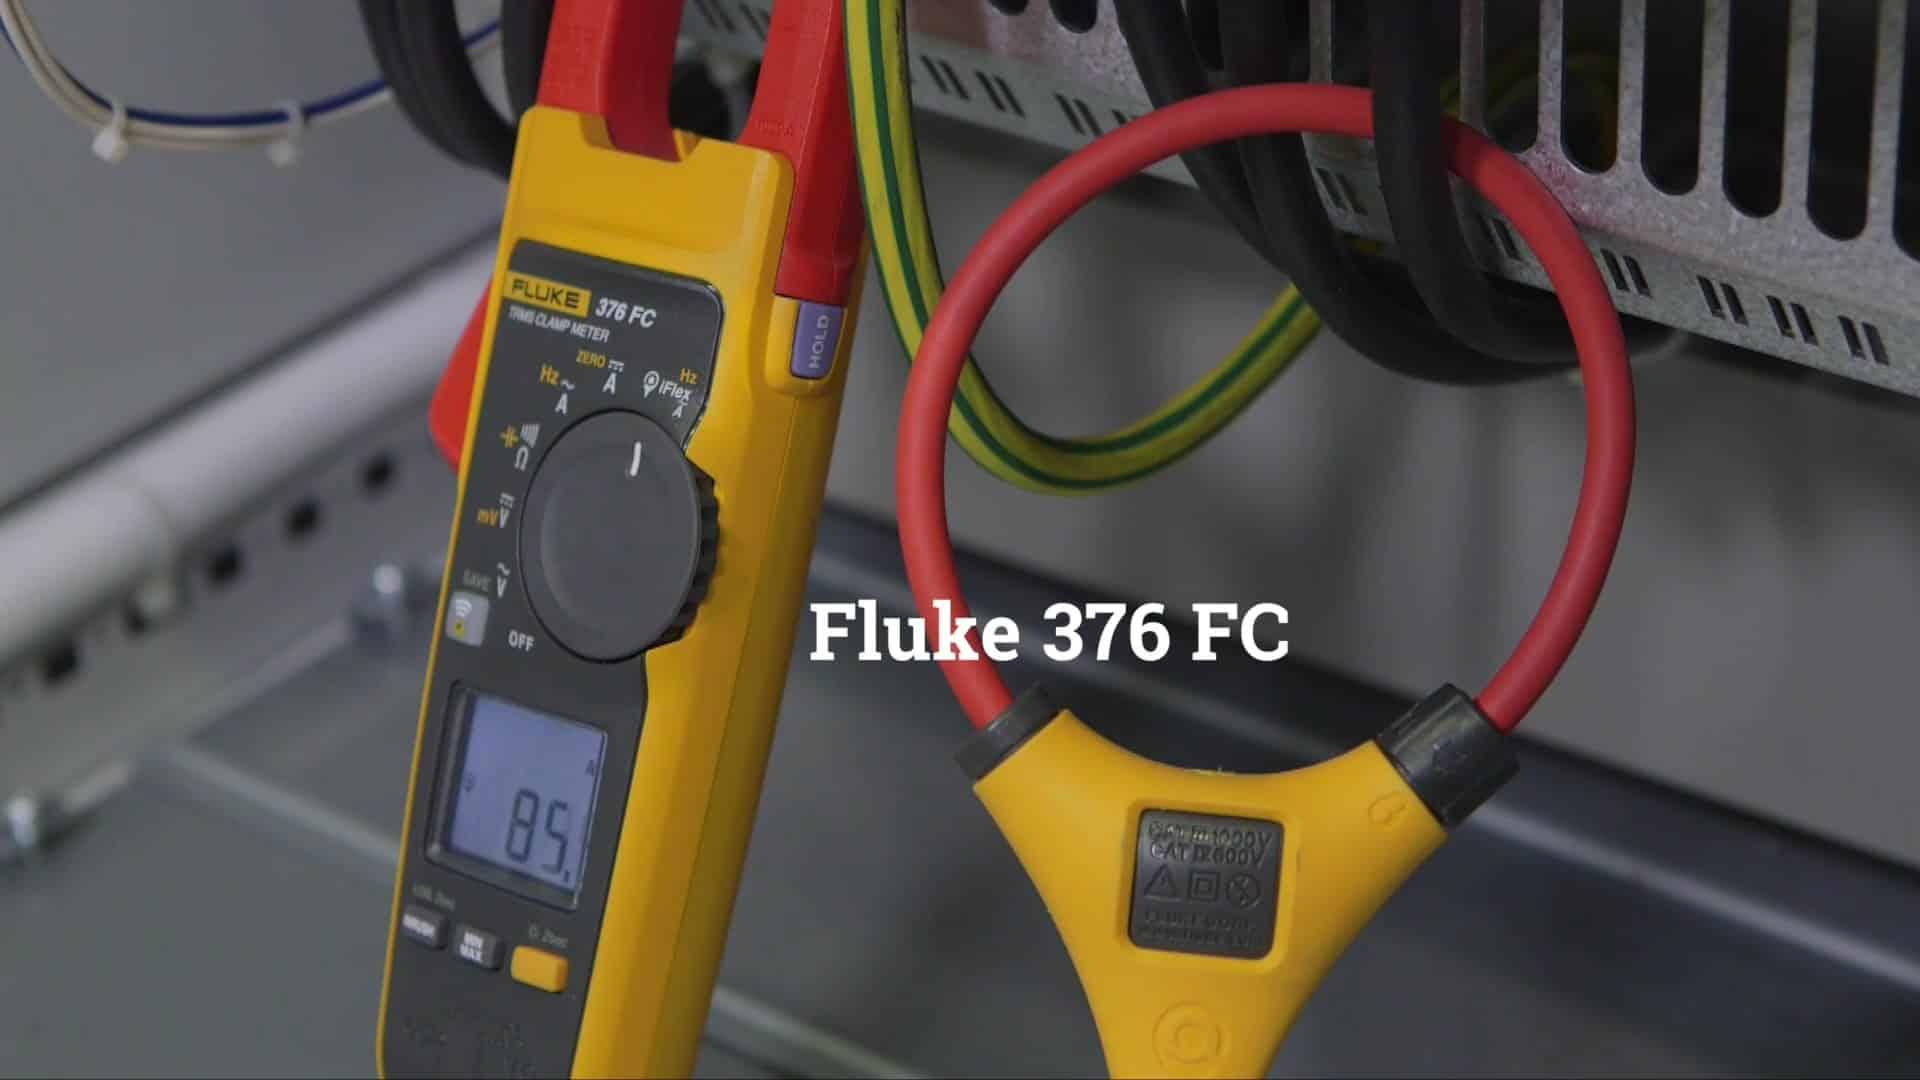 clamp meters for industrial